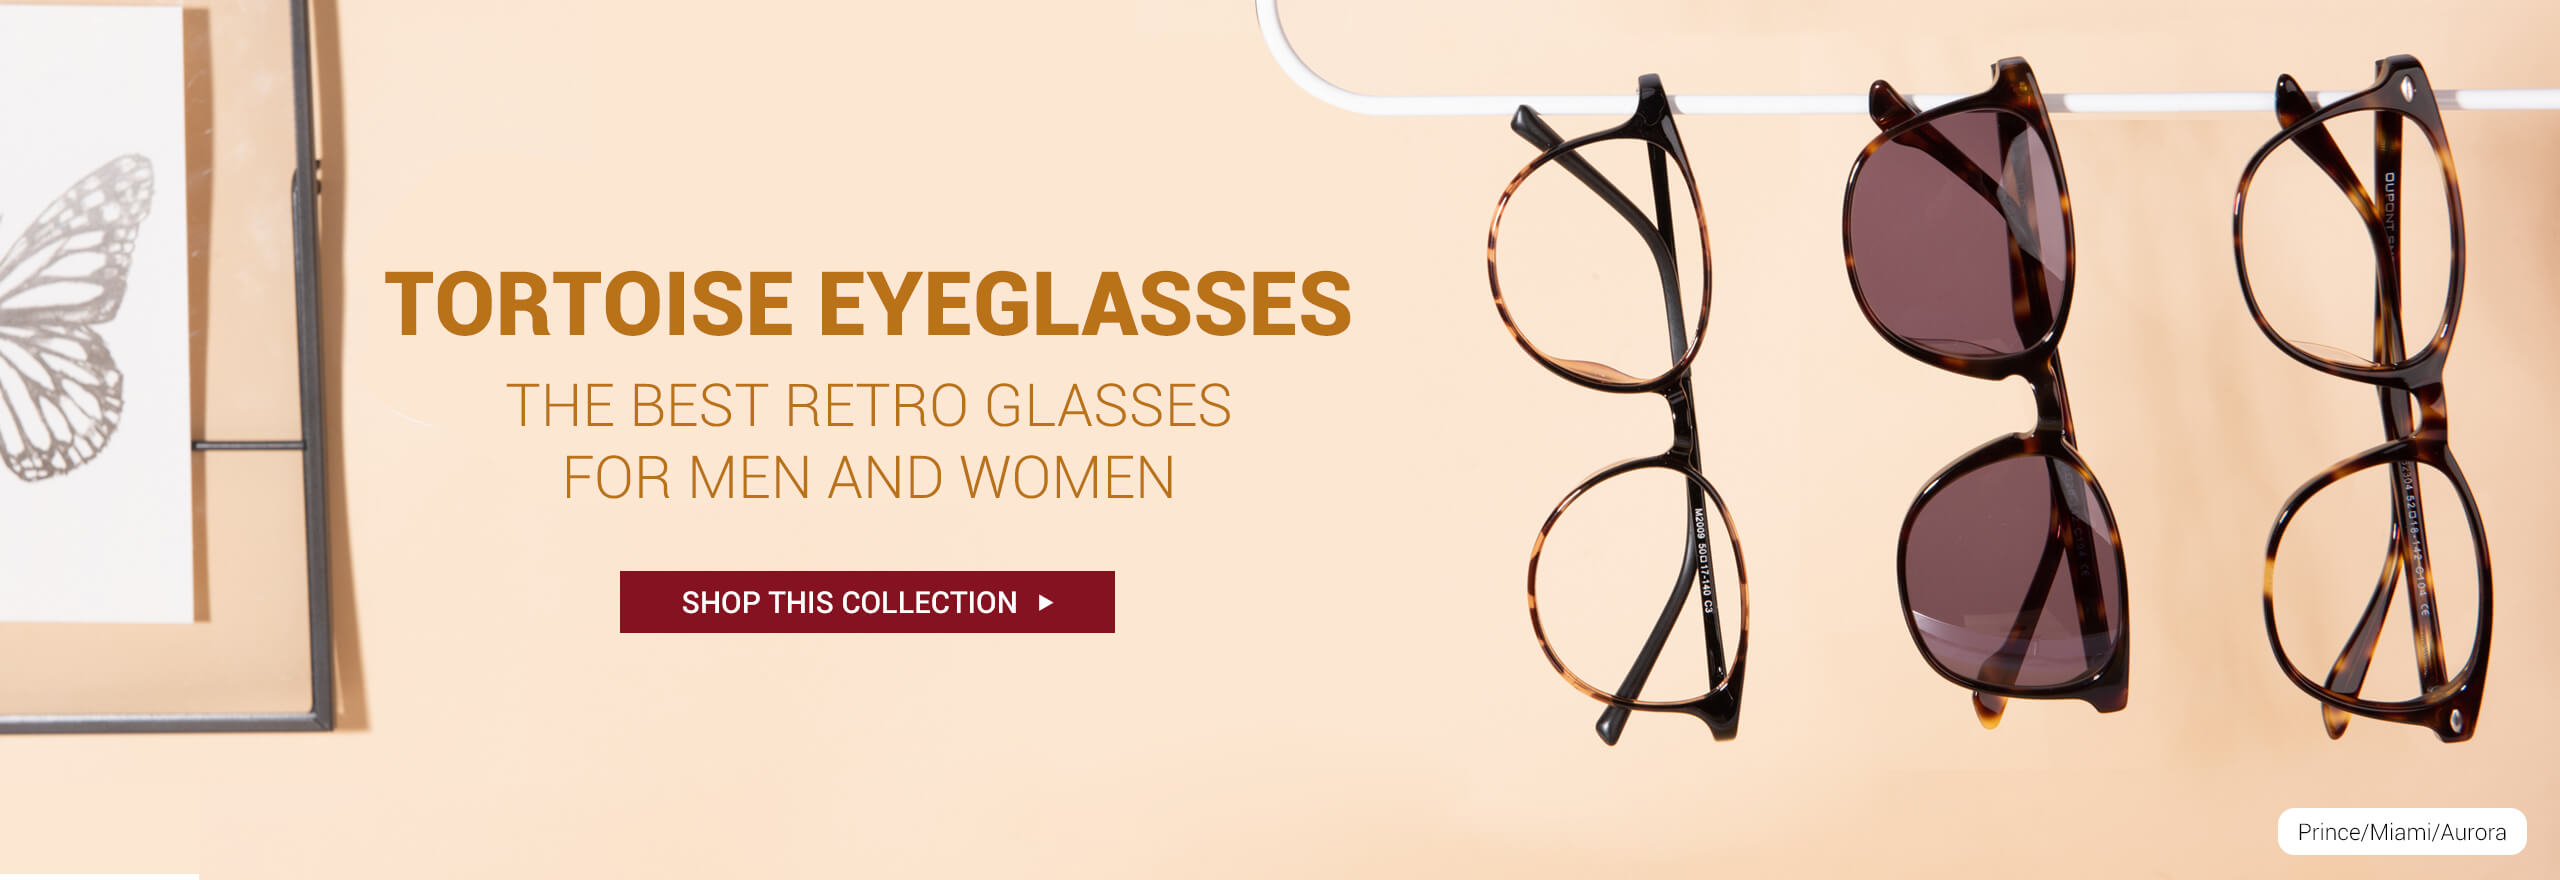 https://glassesshop-res.cloudinary.com/banners/5f2ccb97d5374.jpg